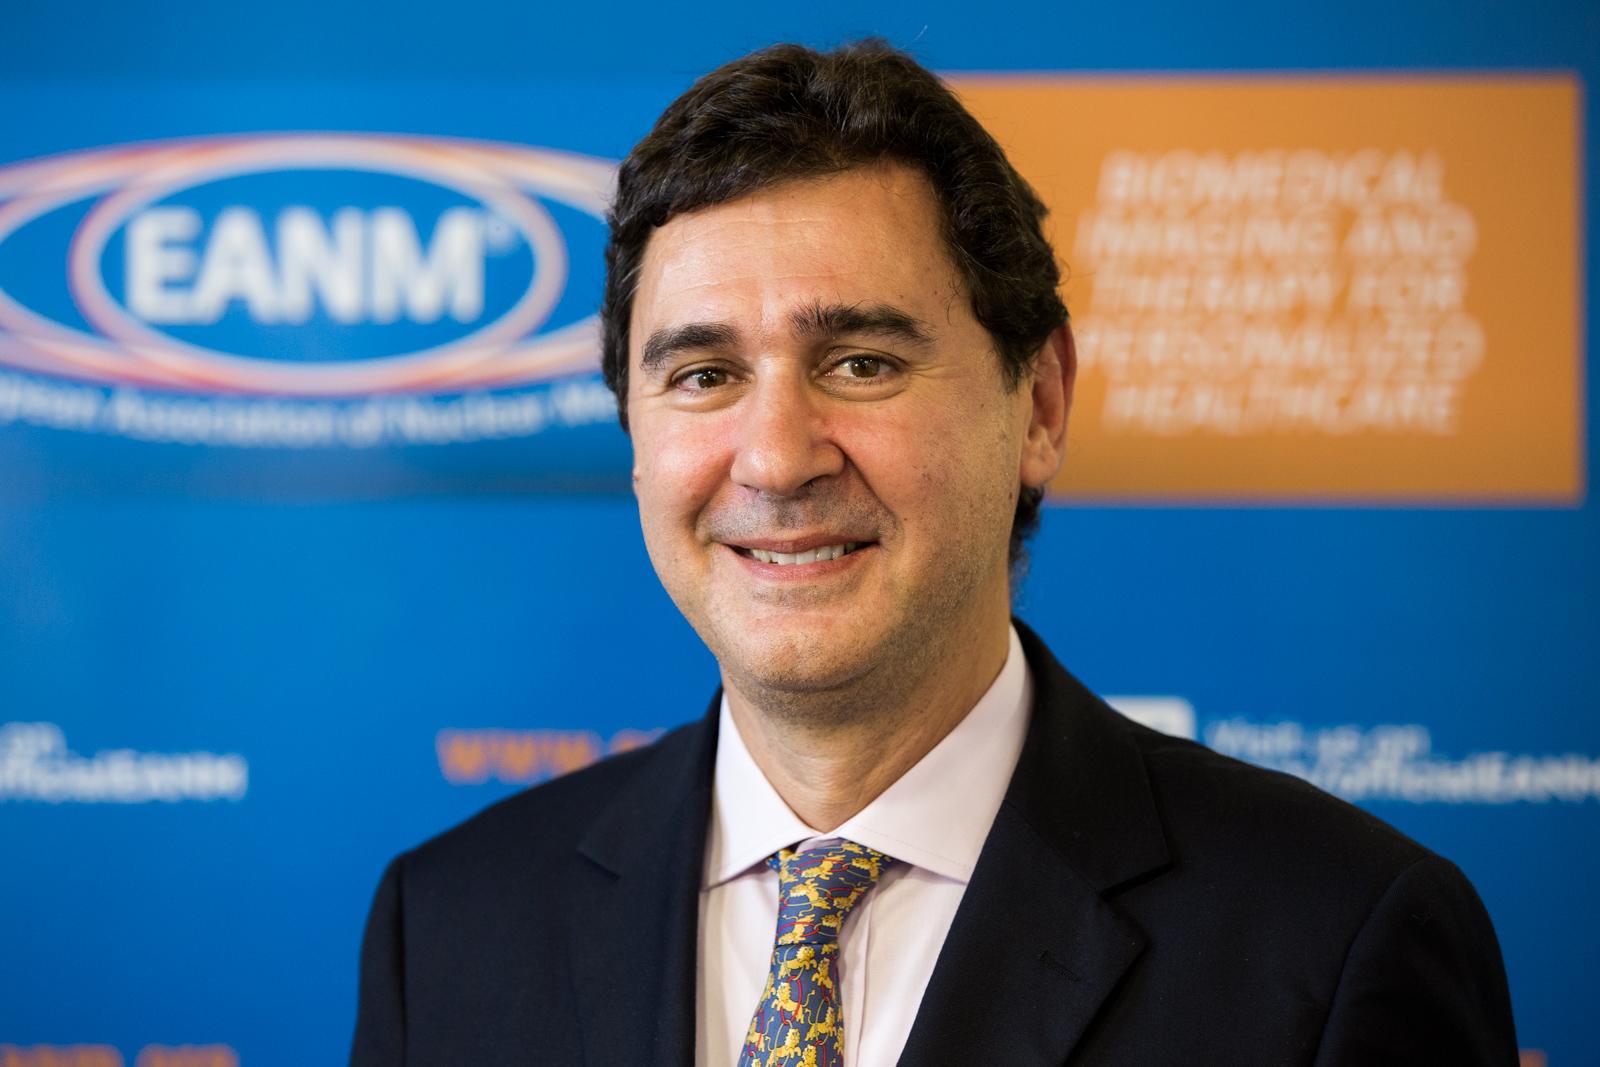 Francesco Giammarile